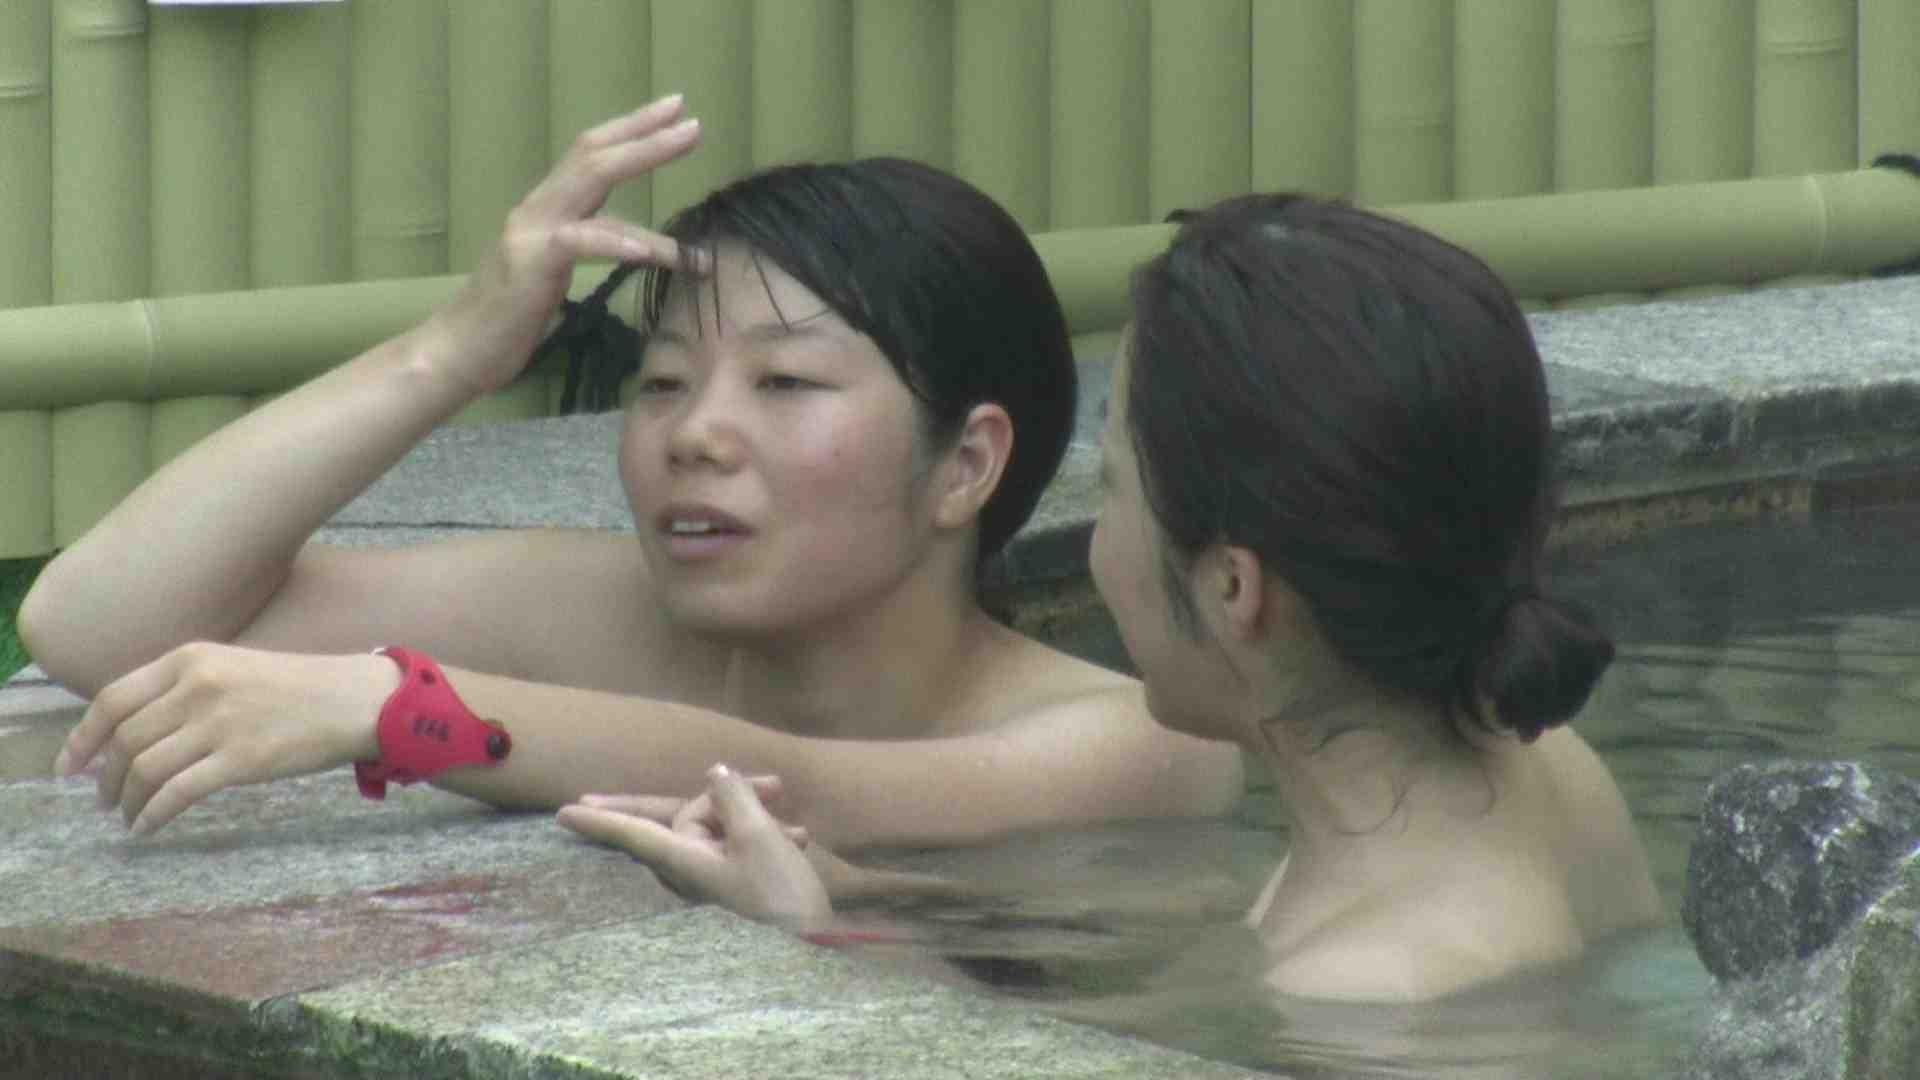 Aquaな露天風呂Vol.182 露天 | OLセックス  80画像 46